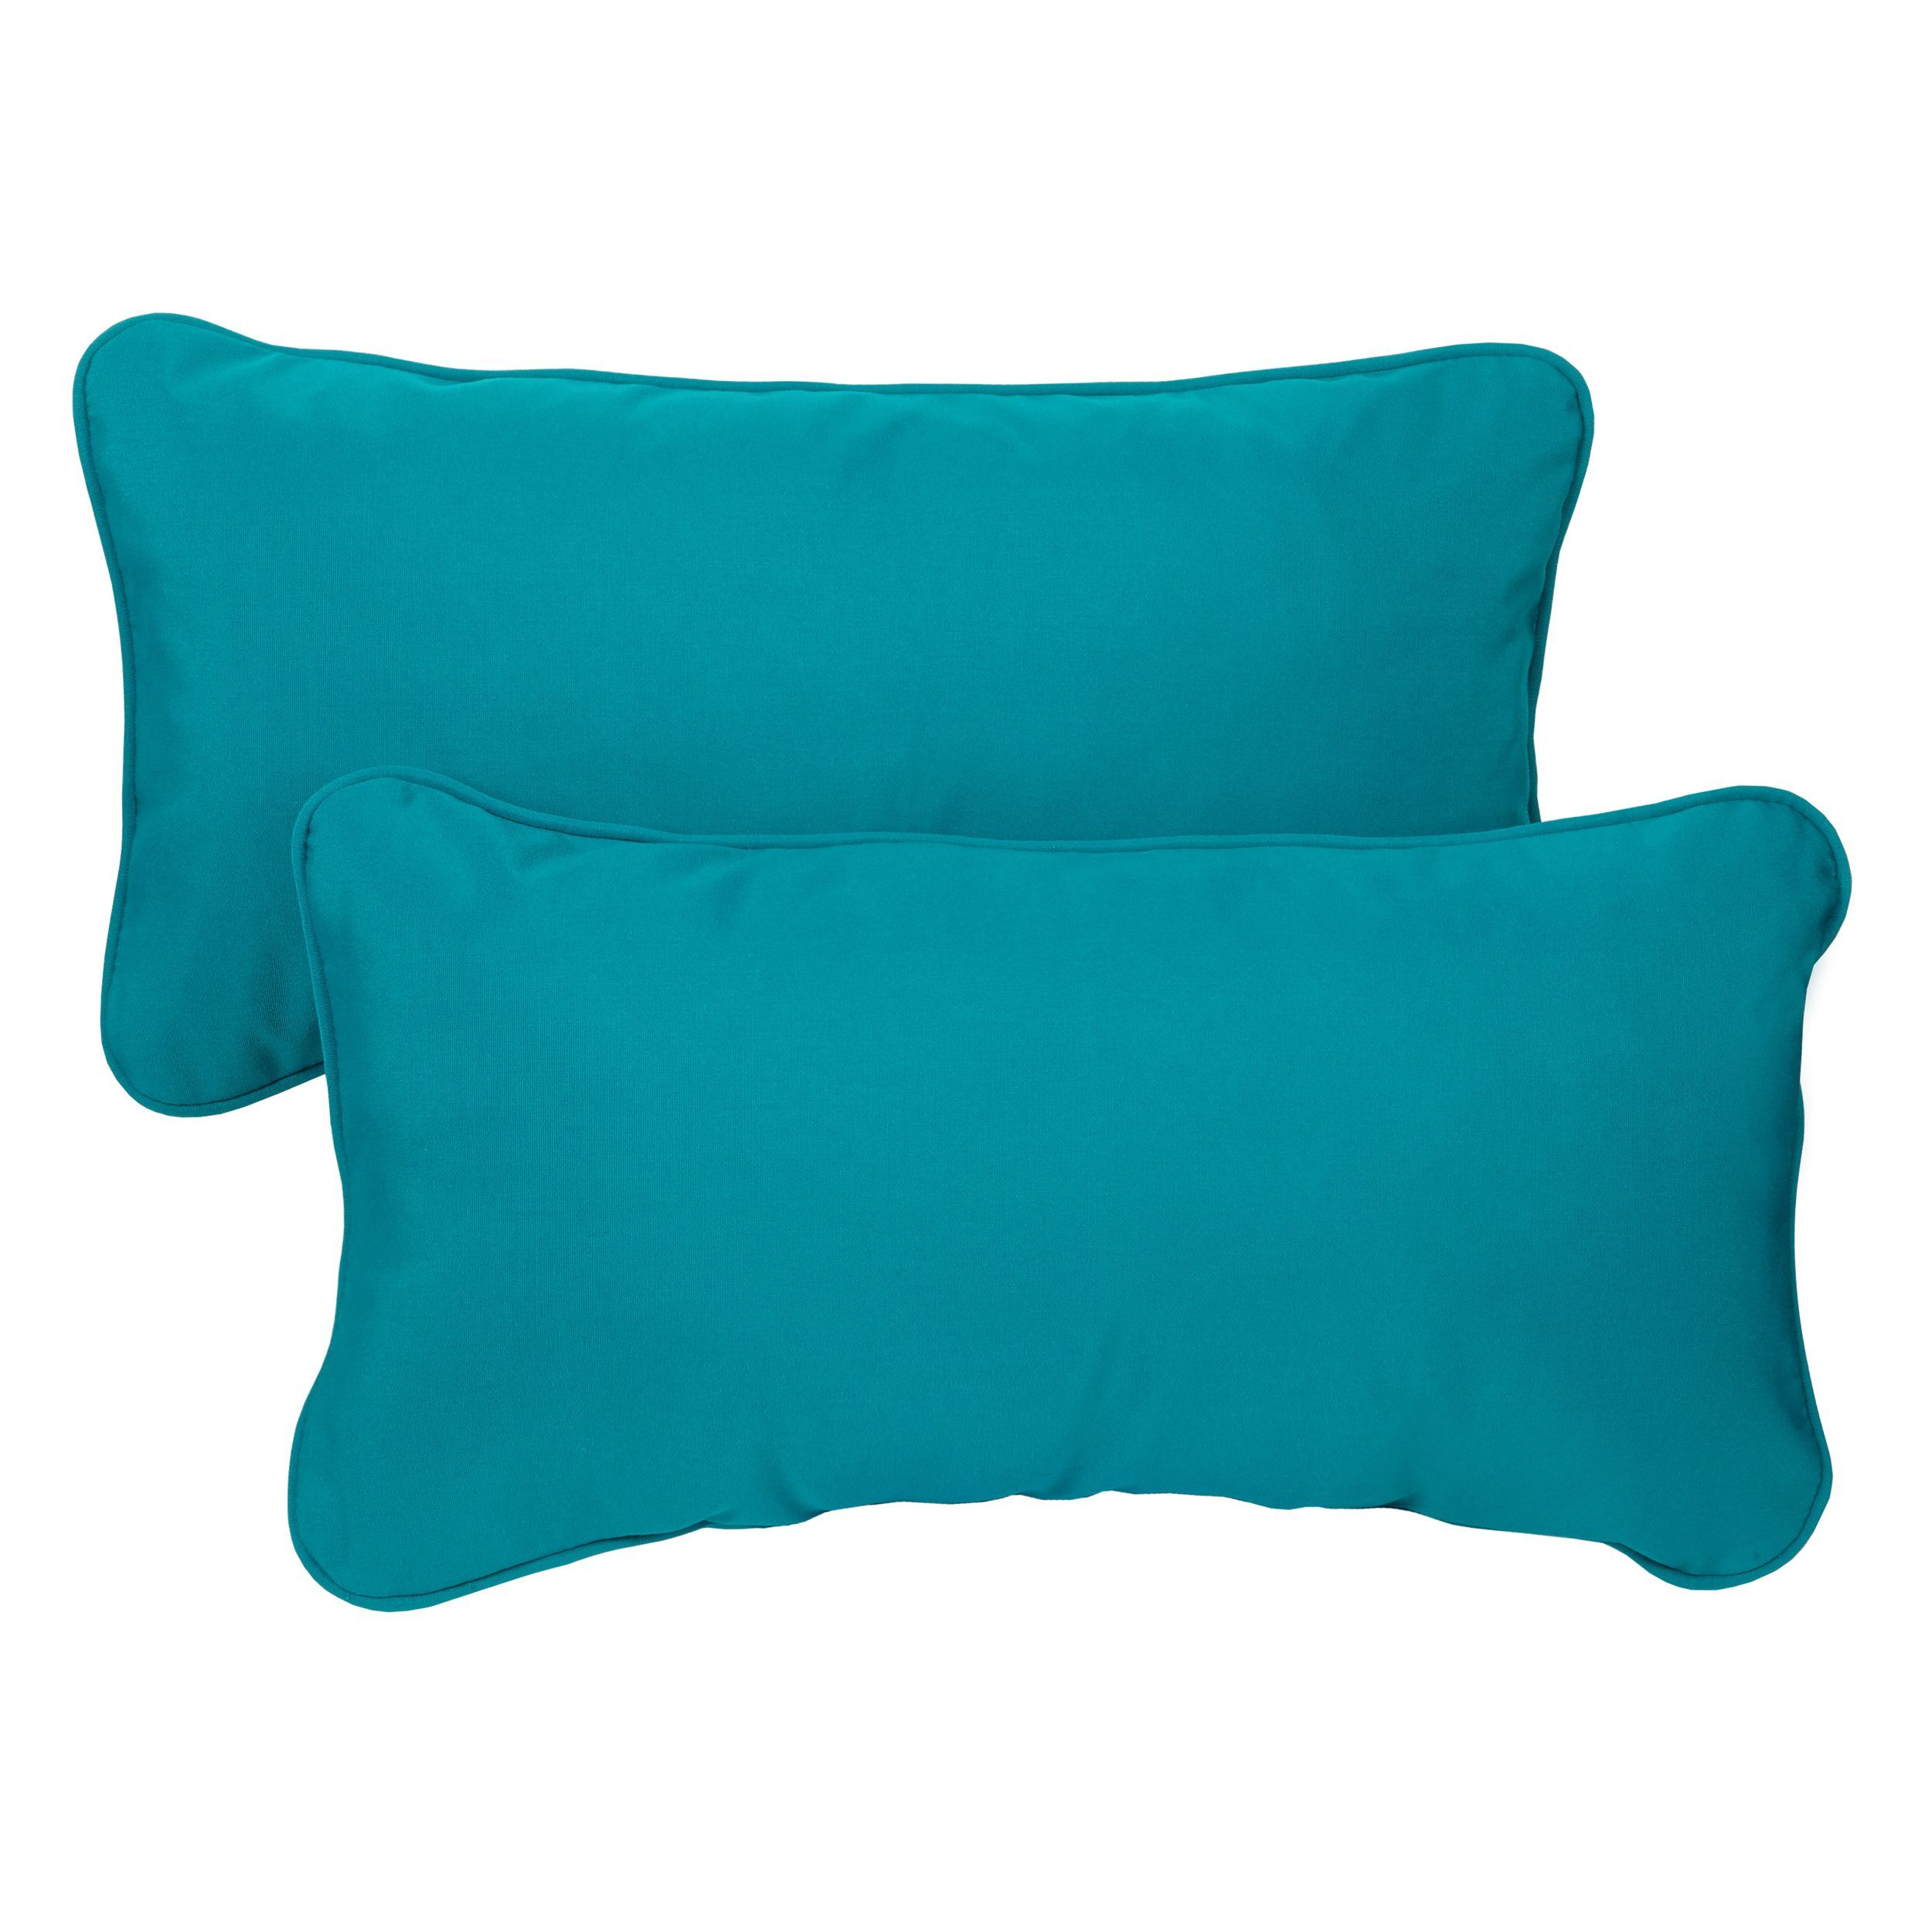 Teal Corded 12 X 24 Inch Indoor/ Outdoor Lumbar Pillows With Sunbrella  Fabric (Set